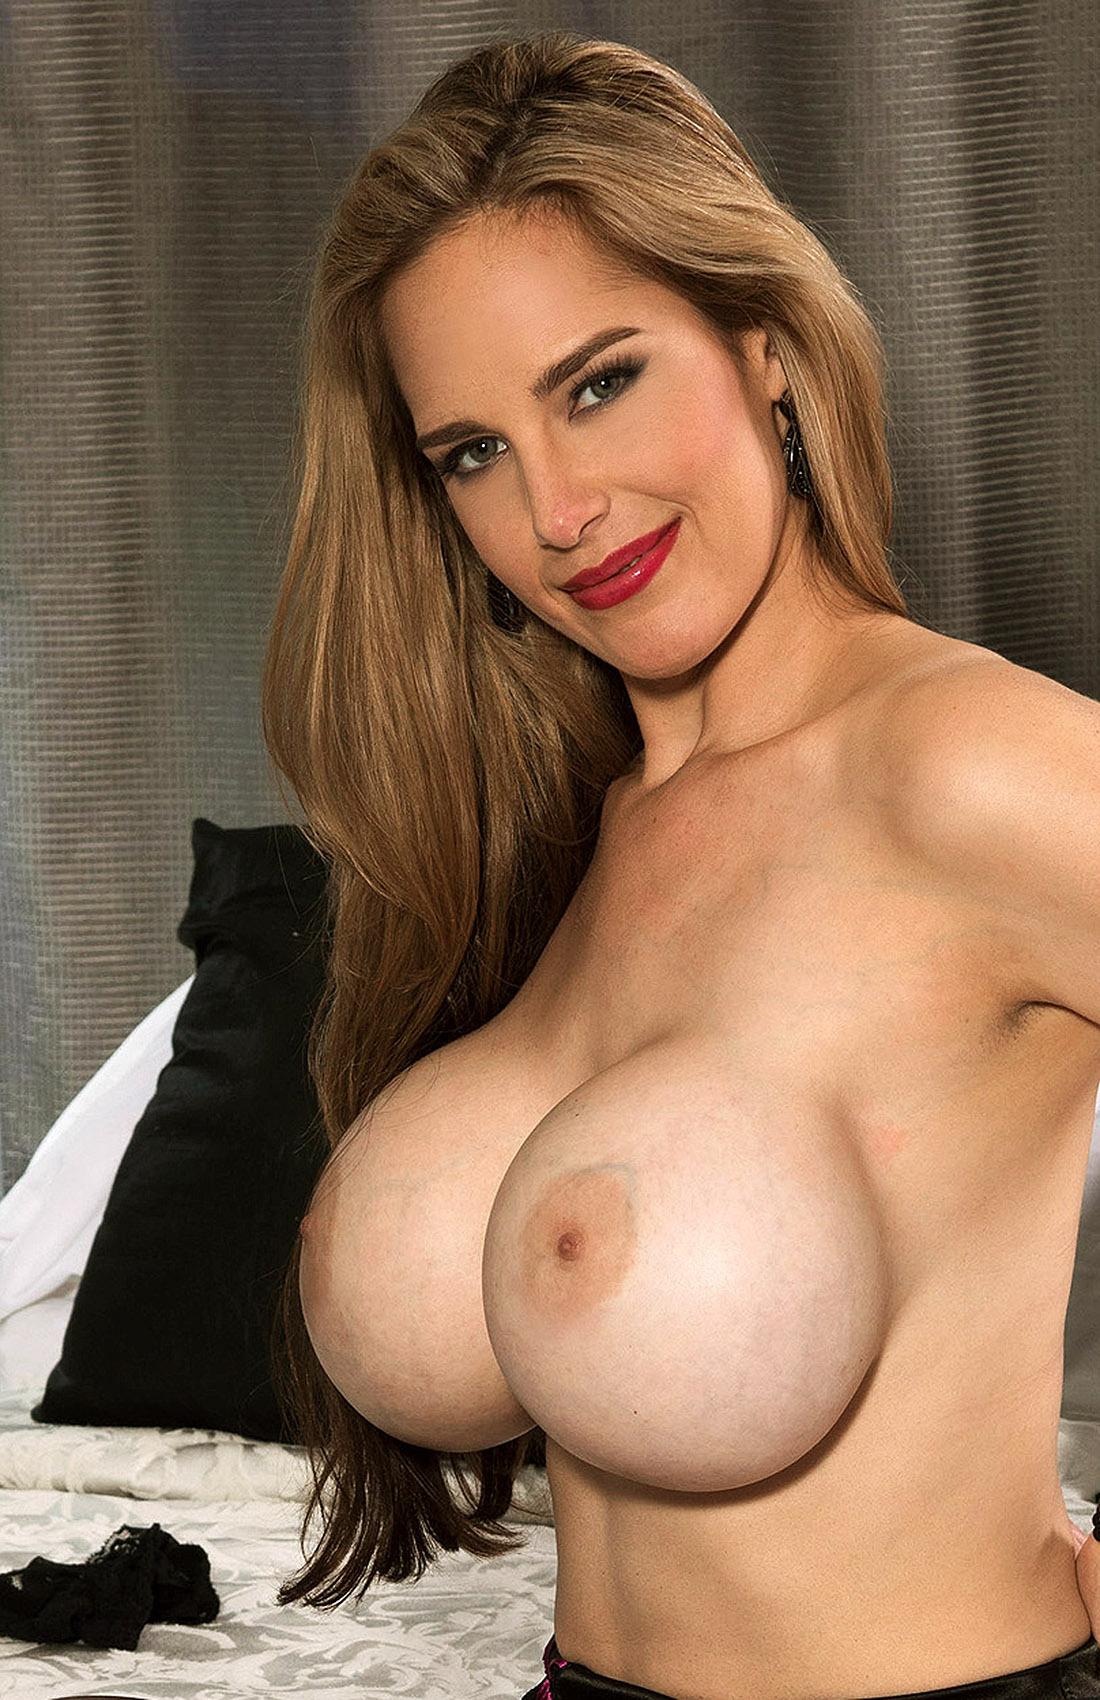 tumblr huge fake tits